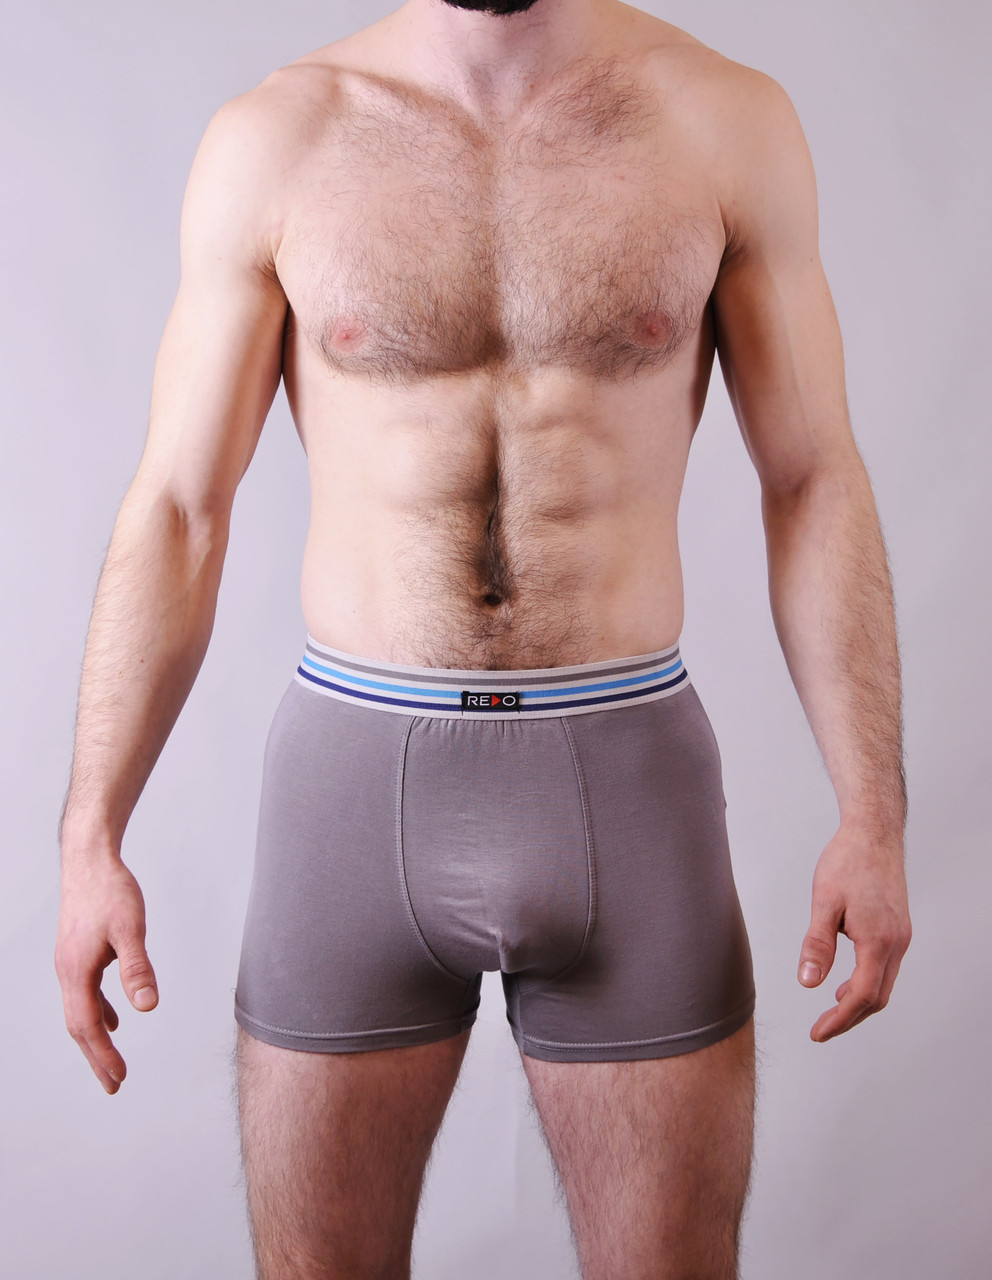 Мужские трусы - боксеры Redo  #1588  XL серый